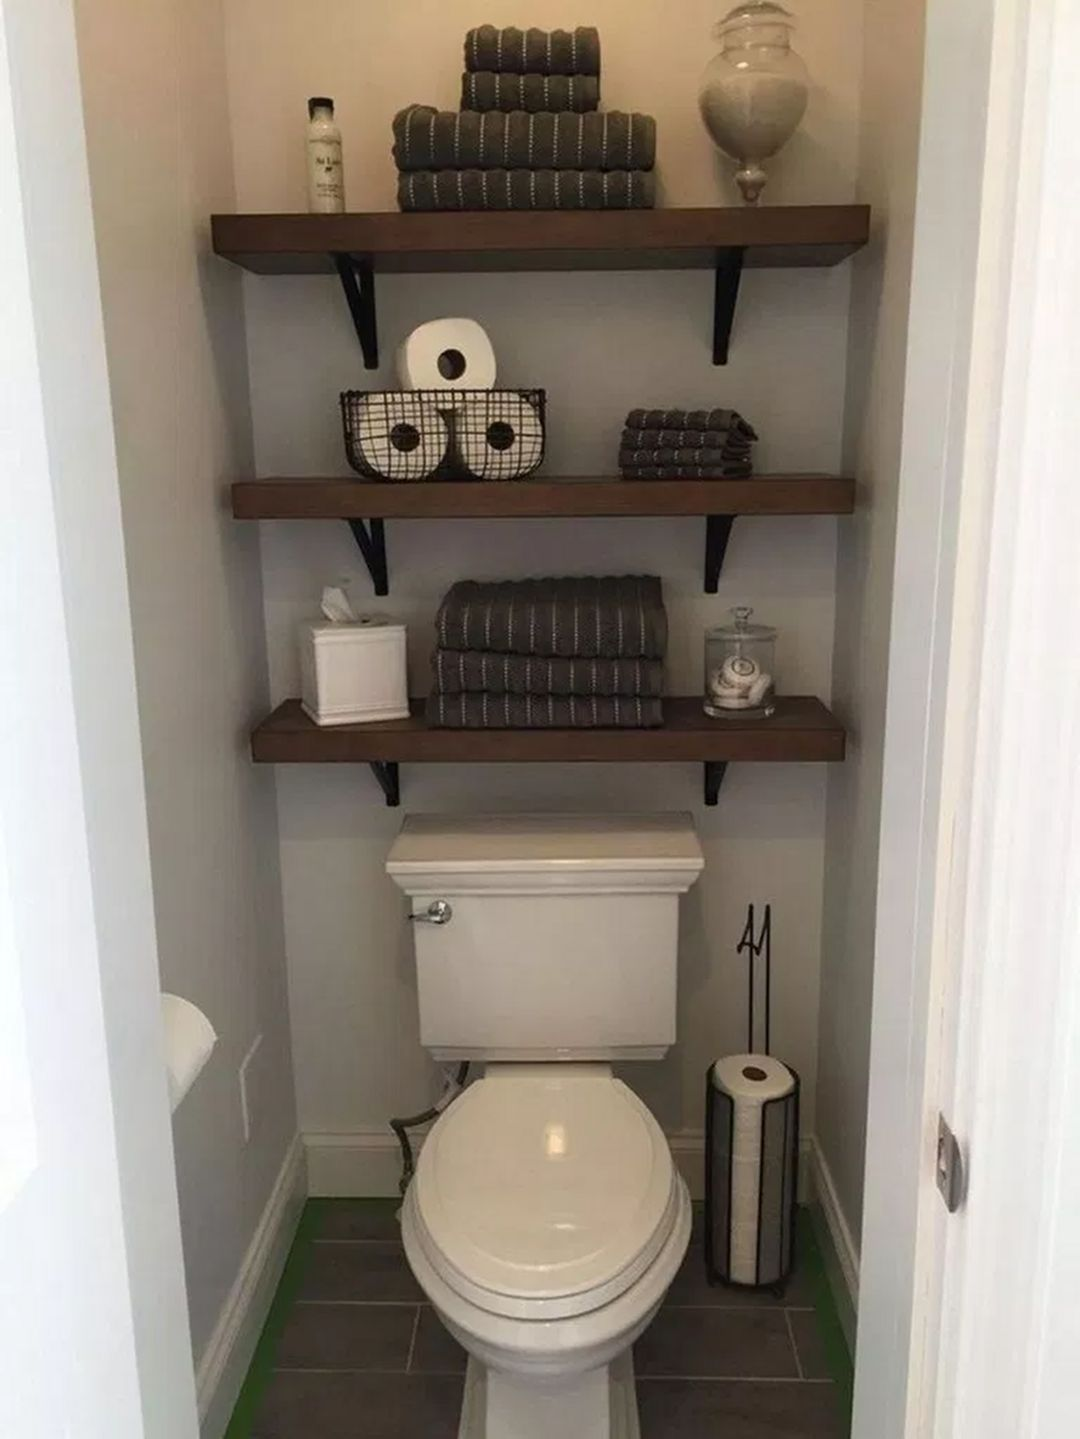 Top 15 Diy Bathroom Wall Shelves Ideas To Organize Easily Small Bathroom Decor Small Bathroom Bathroom Closet Organization